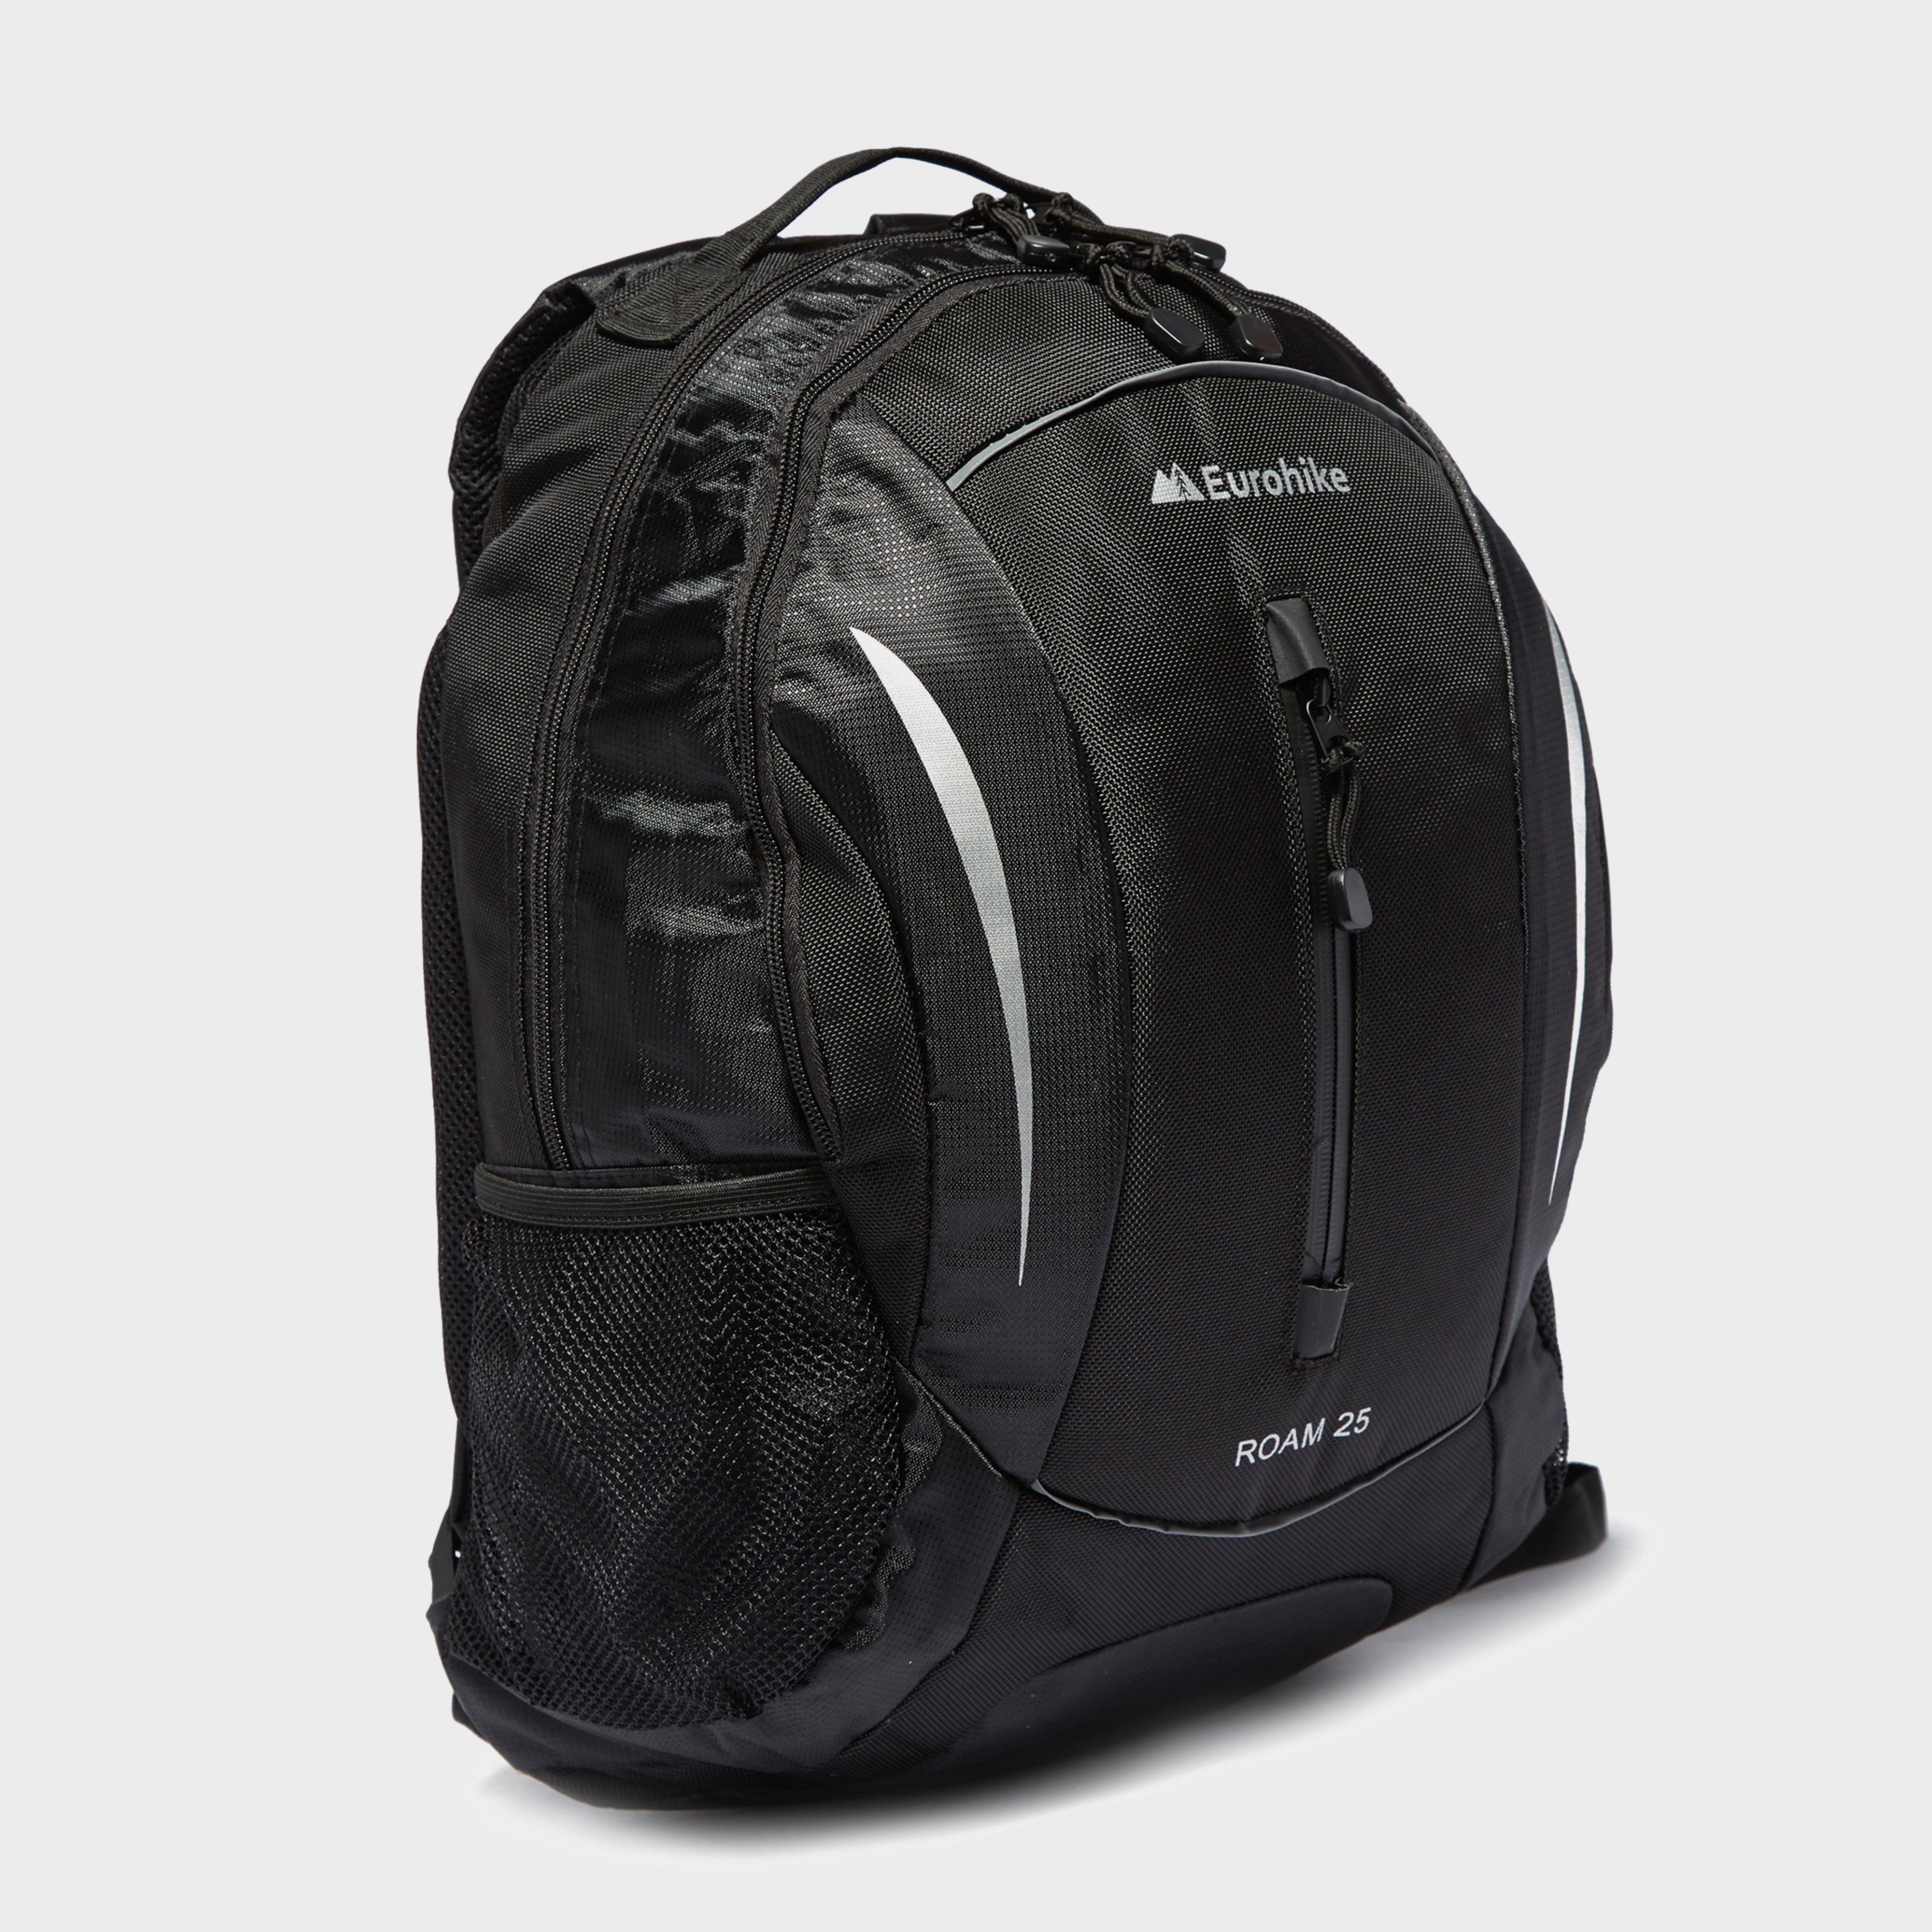 Eurohike Eurohike Roam 25L Daysack - Black, Black